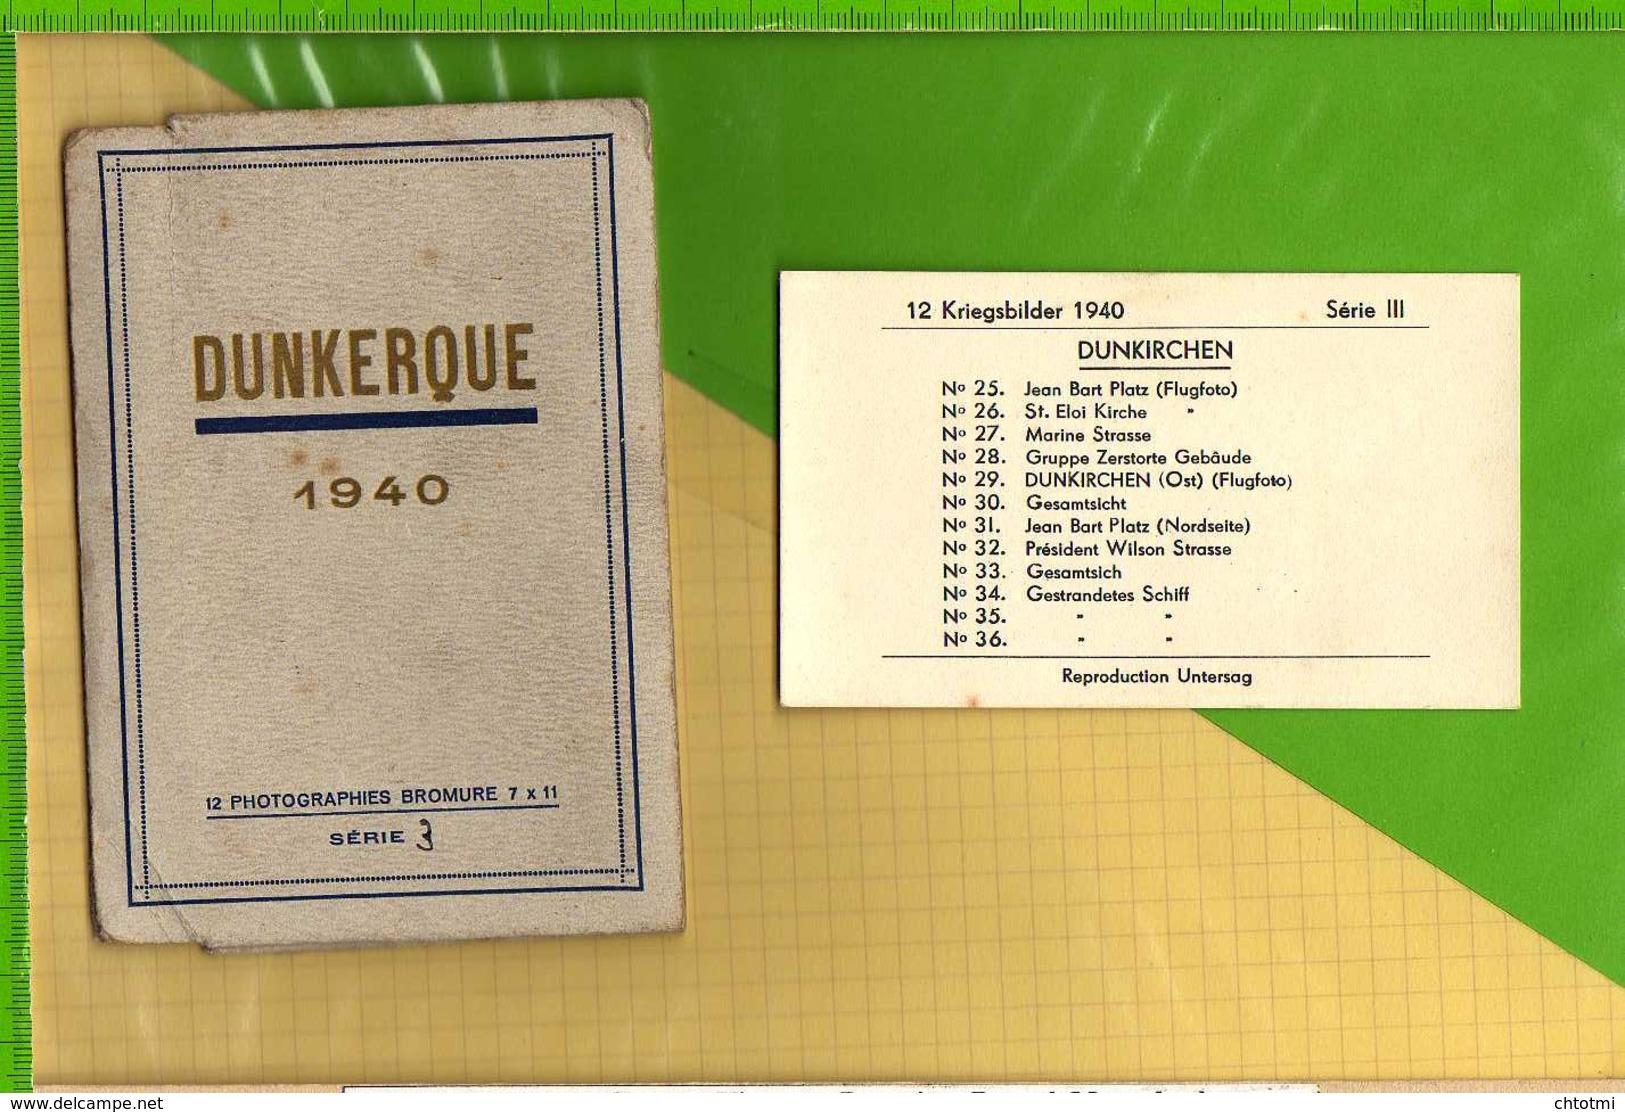 DUNKERQUE 12 Photographies Bromure 7X11 Liste En Scan - Dunkerque